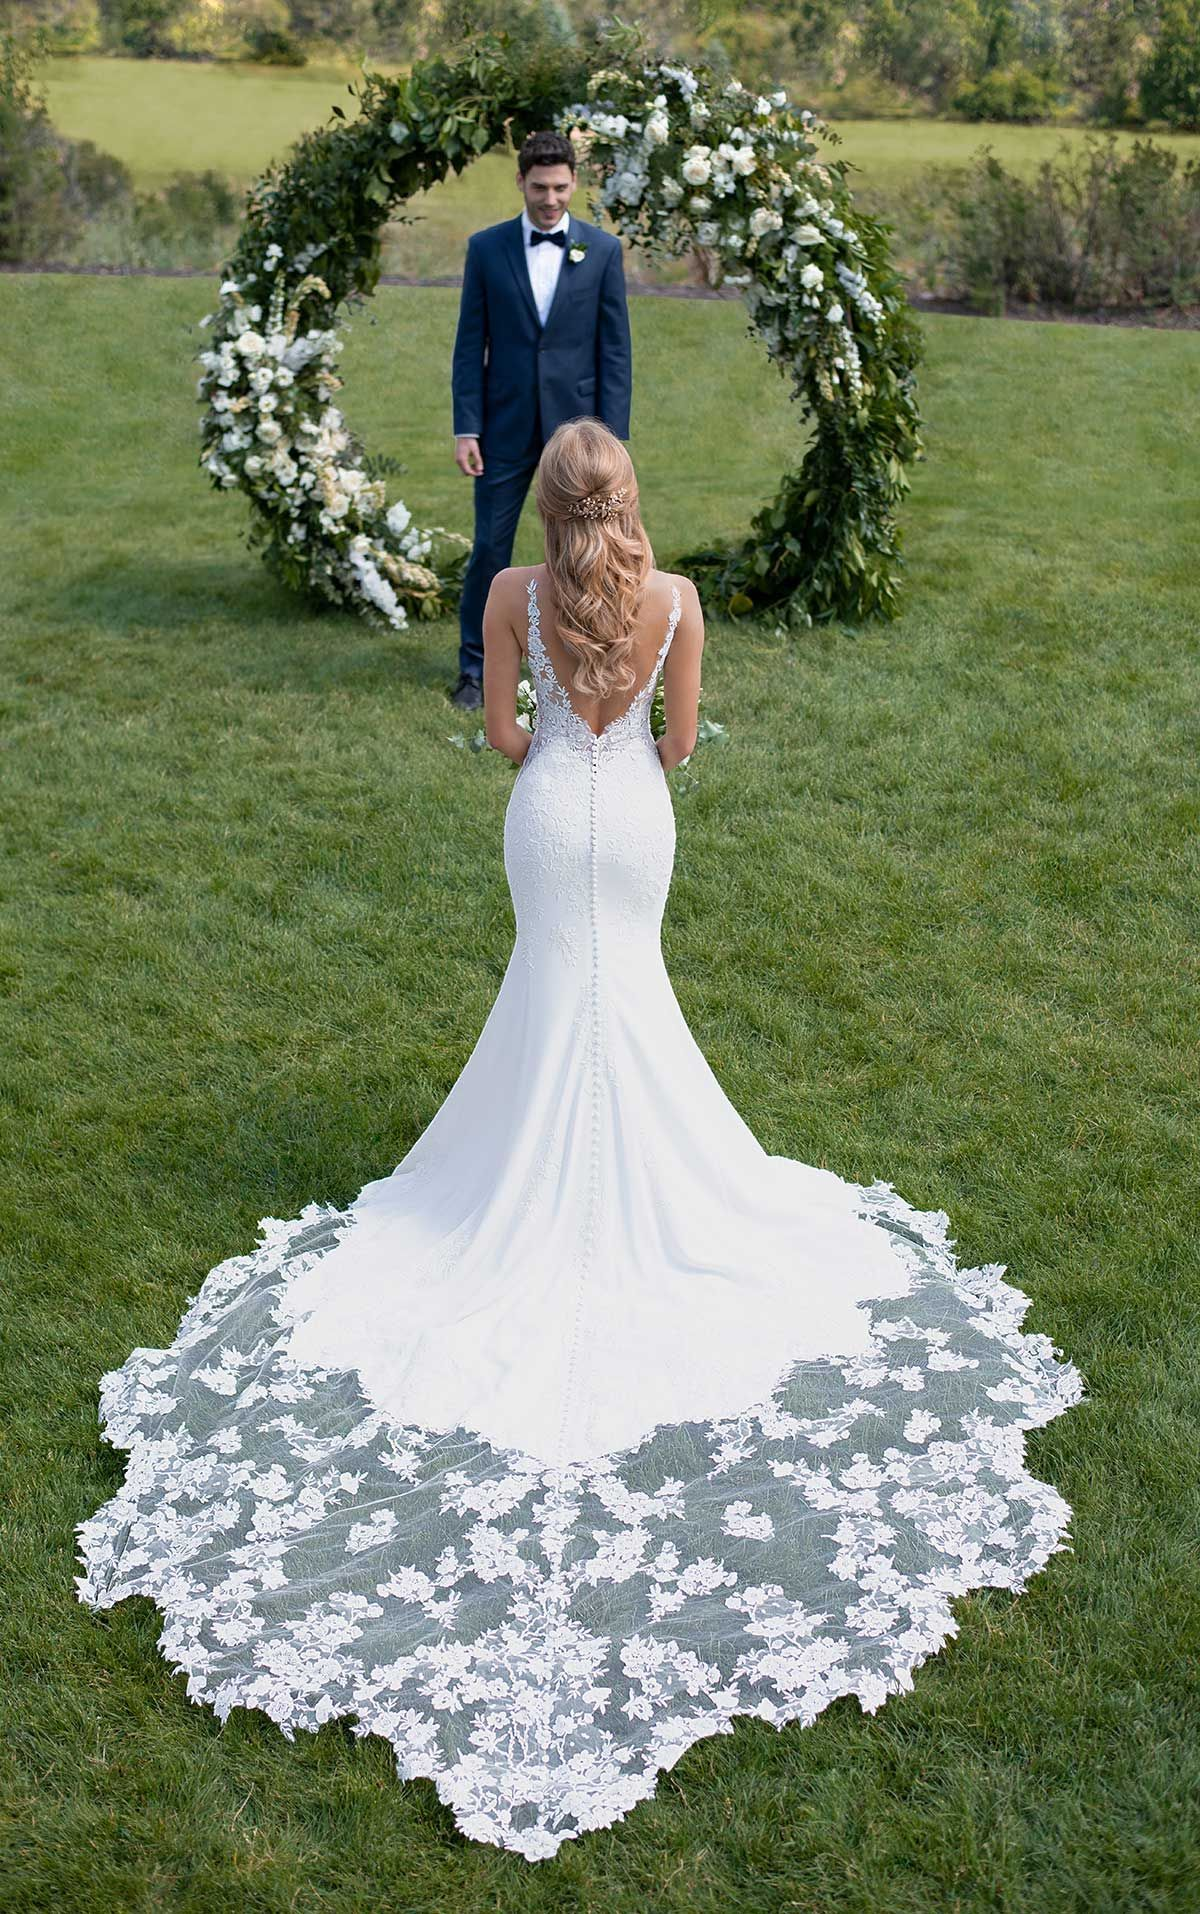 Botanical Lace Wedding Dress with Shaped Train - Martina Liana